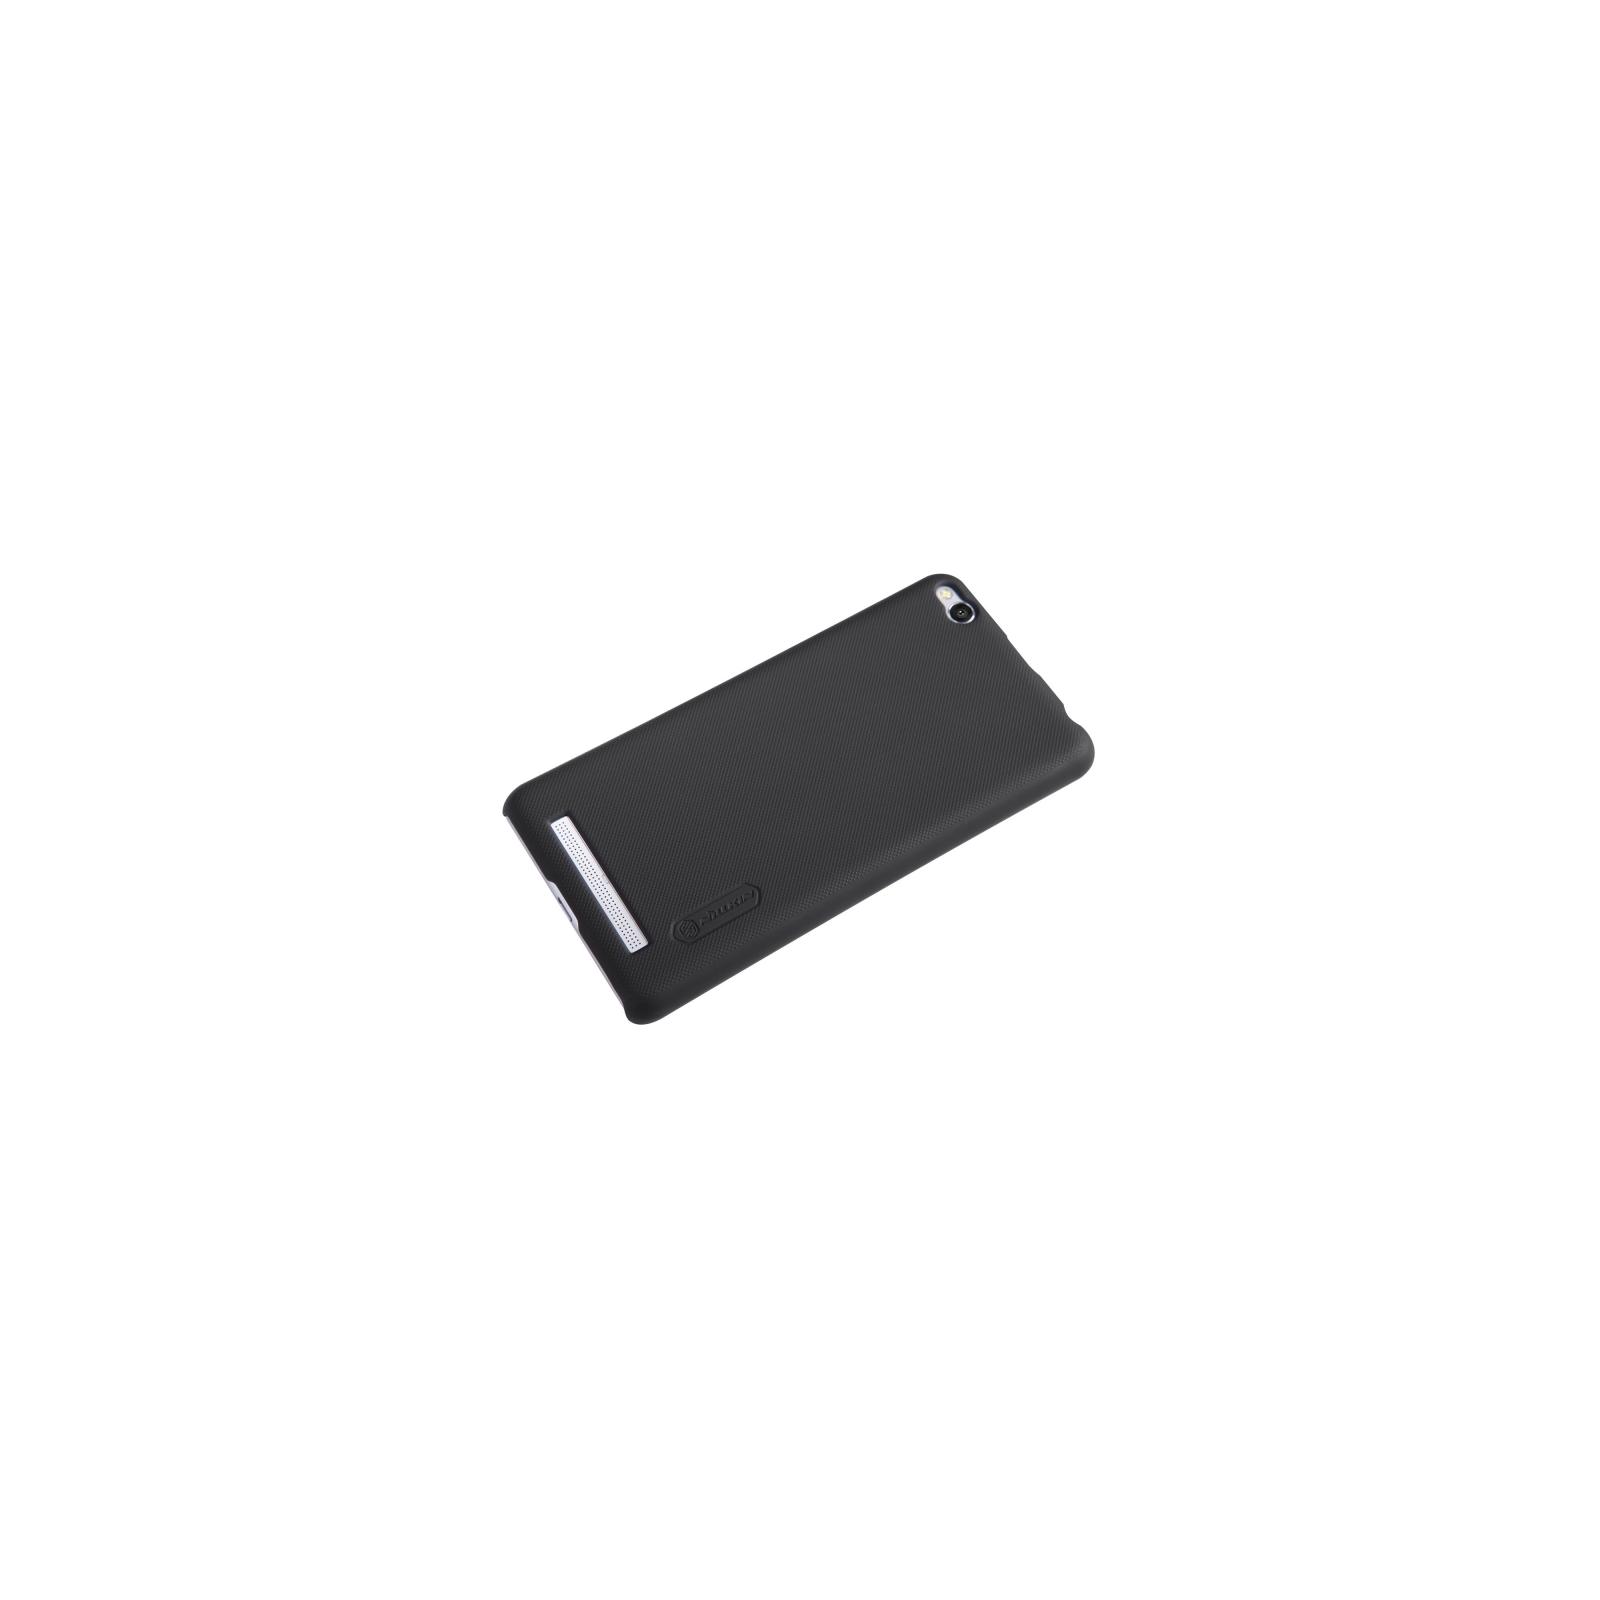 Чехол для моб. телефона NILLKIN для Xiaomi Redmi3 - Super Frosted Shield (Black) (6274141) изображение 5